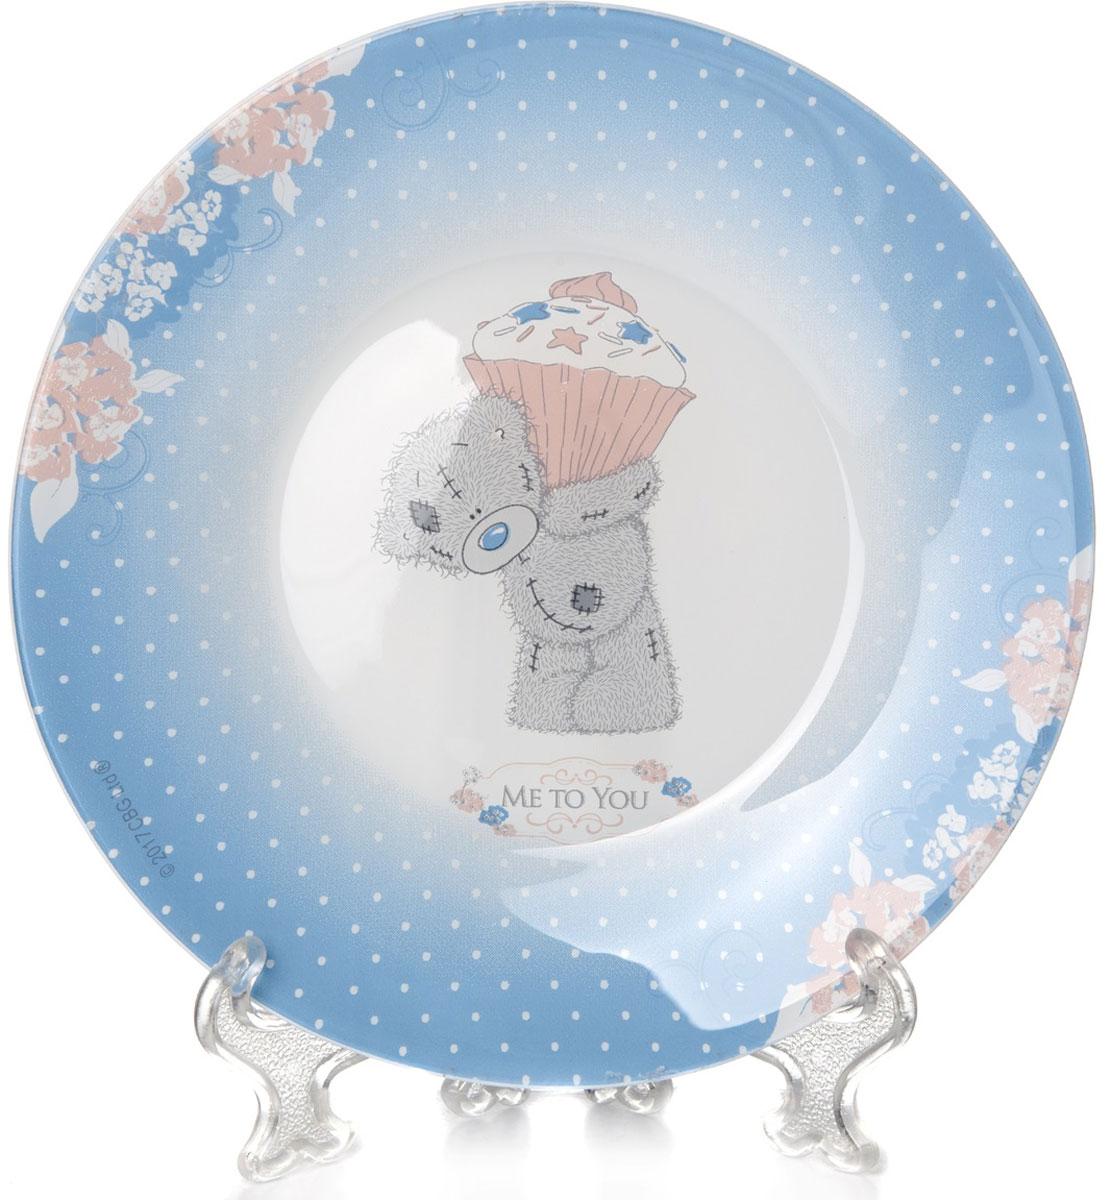 Тарелка Pasabahce Me To You, цвет: голубой, диаметр 19,5 см мешок подарочный me to you 18х24 см